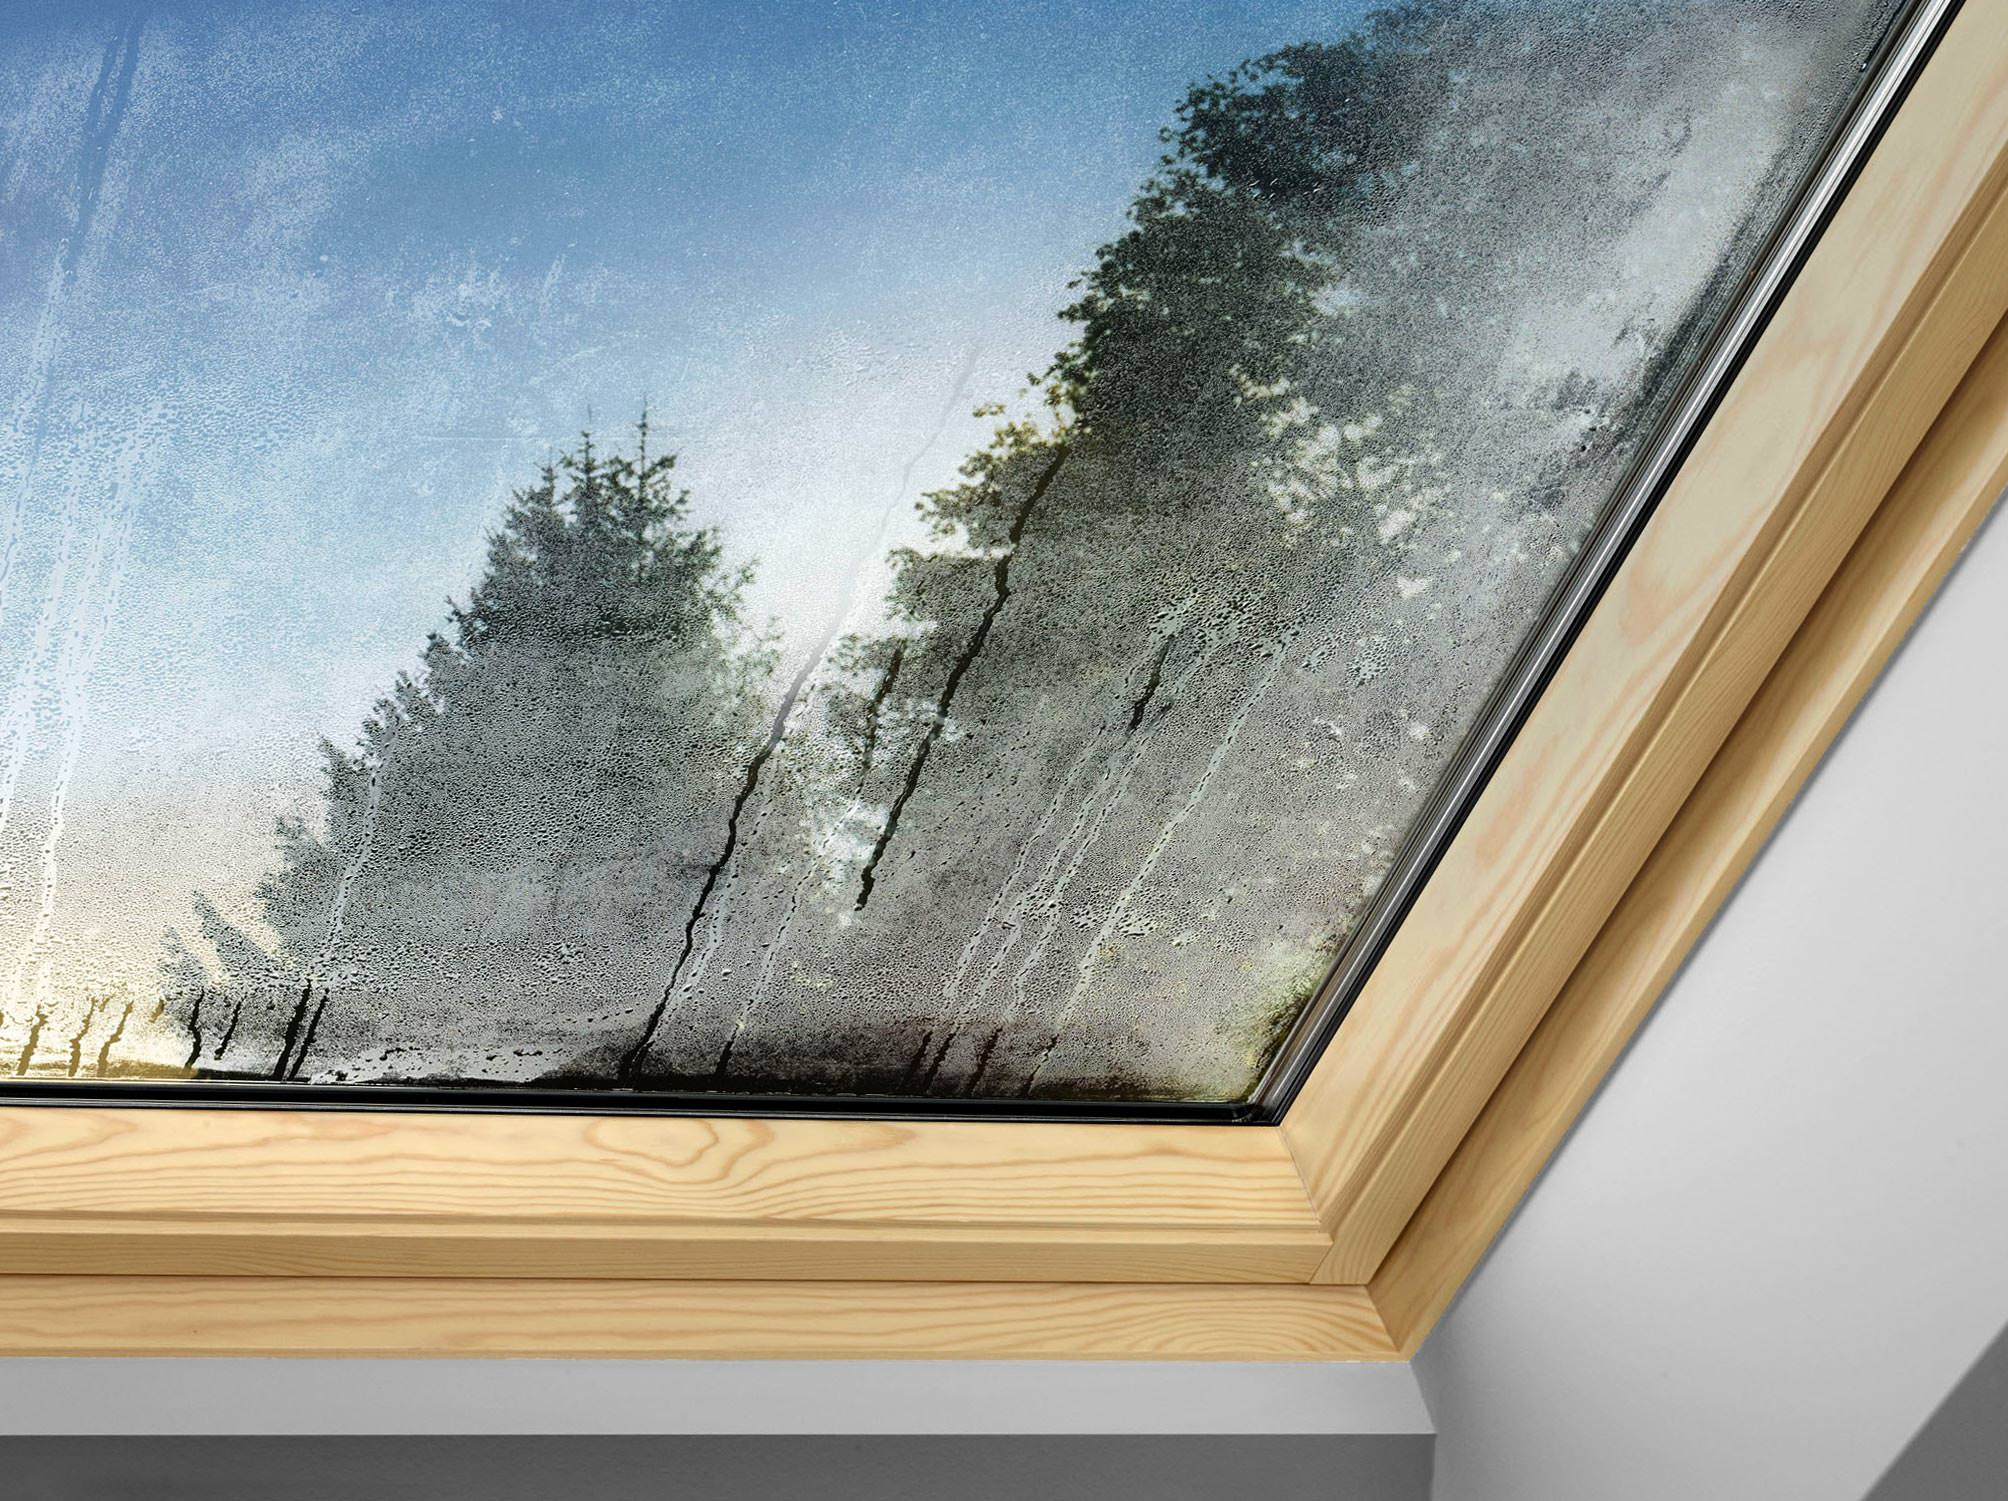 velux dachfenster aussen amazing velux with velux dachfenster aussen elegant velux dachfenster. Black Bedroom Furniture Sets. Home Design Ideas